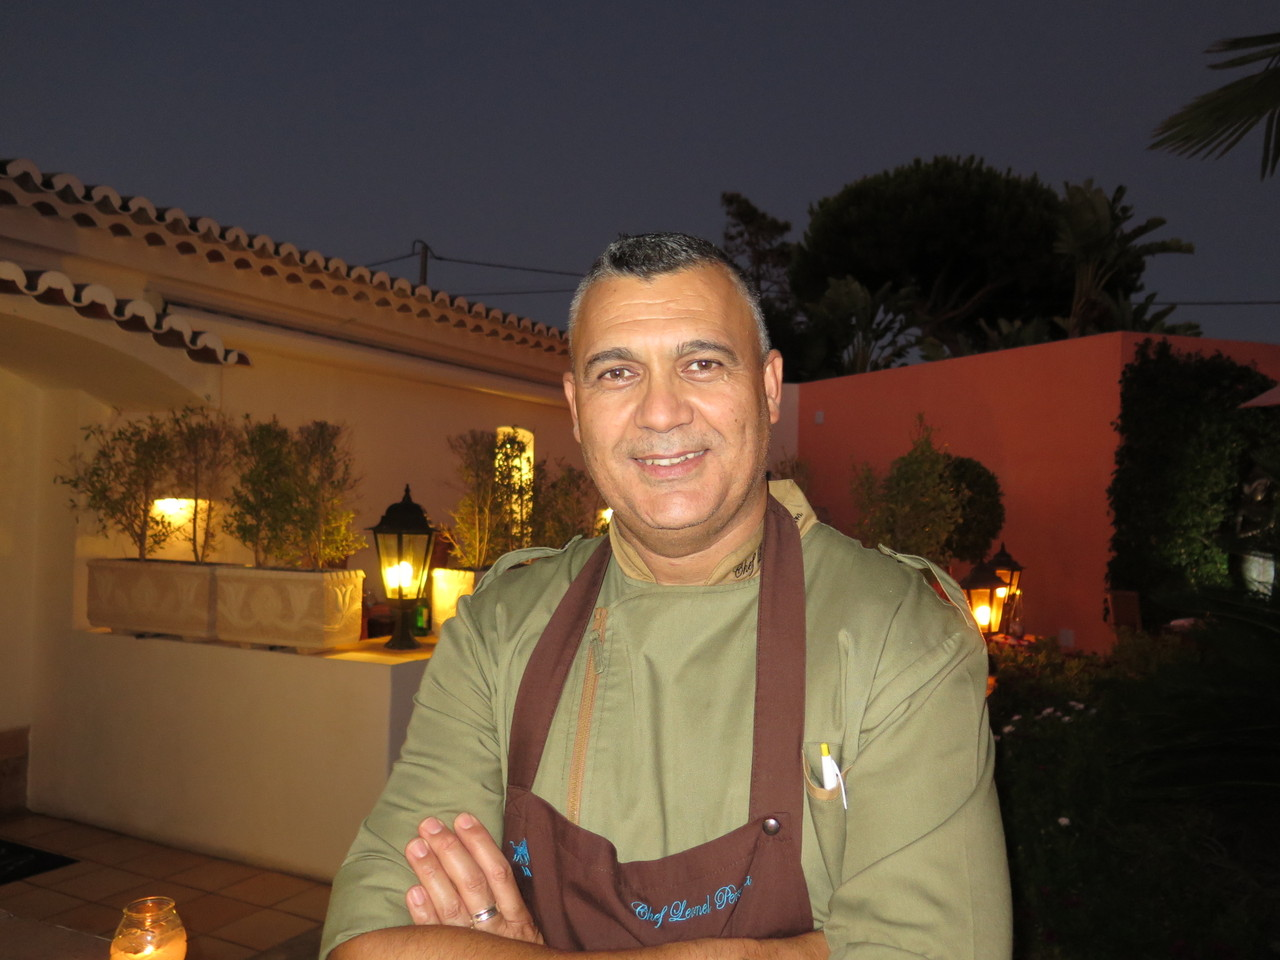 Leonel Pereira